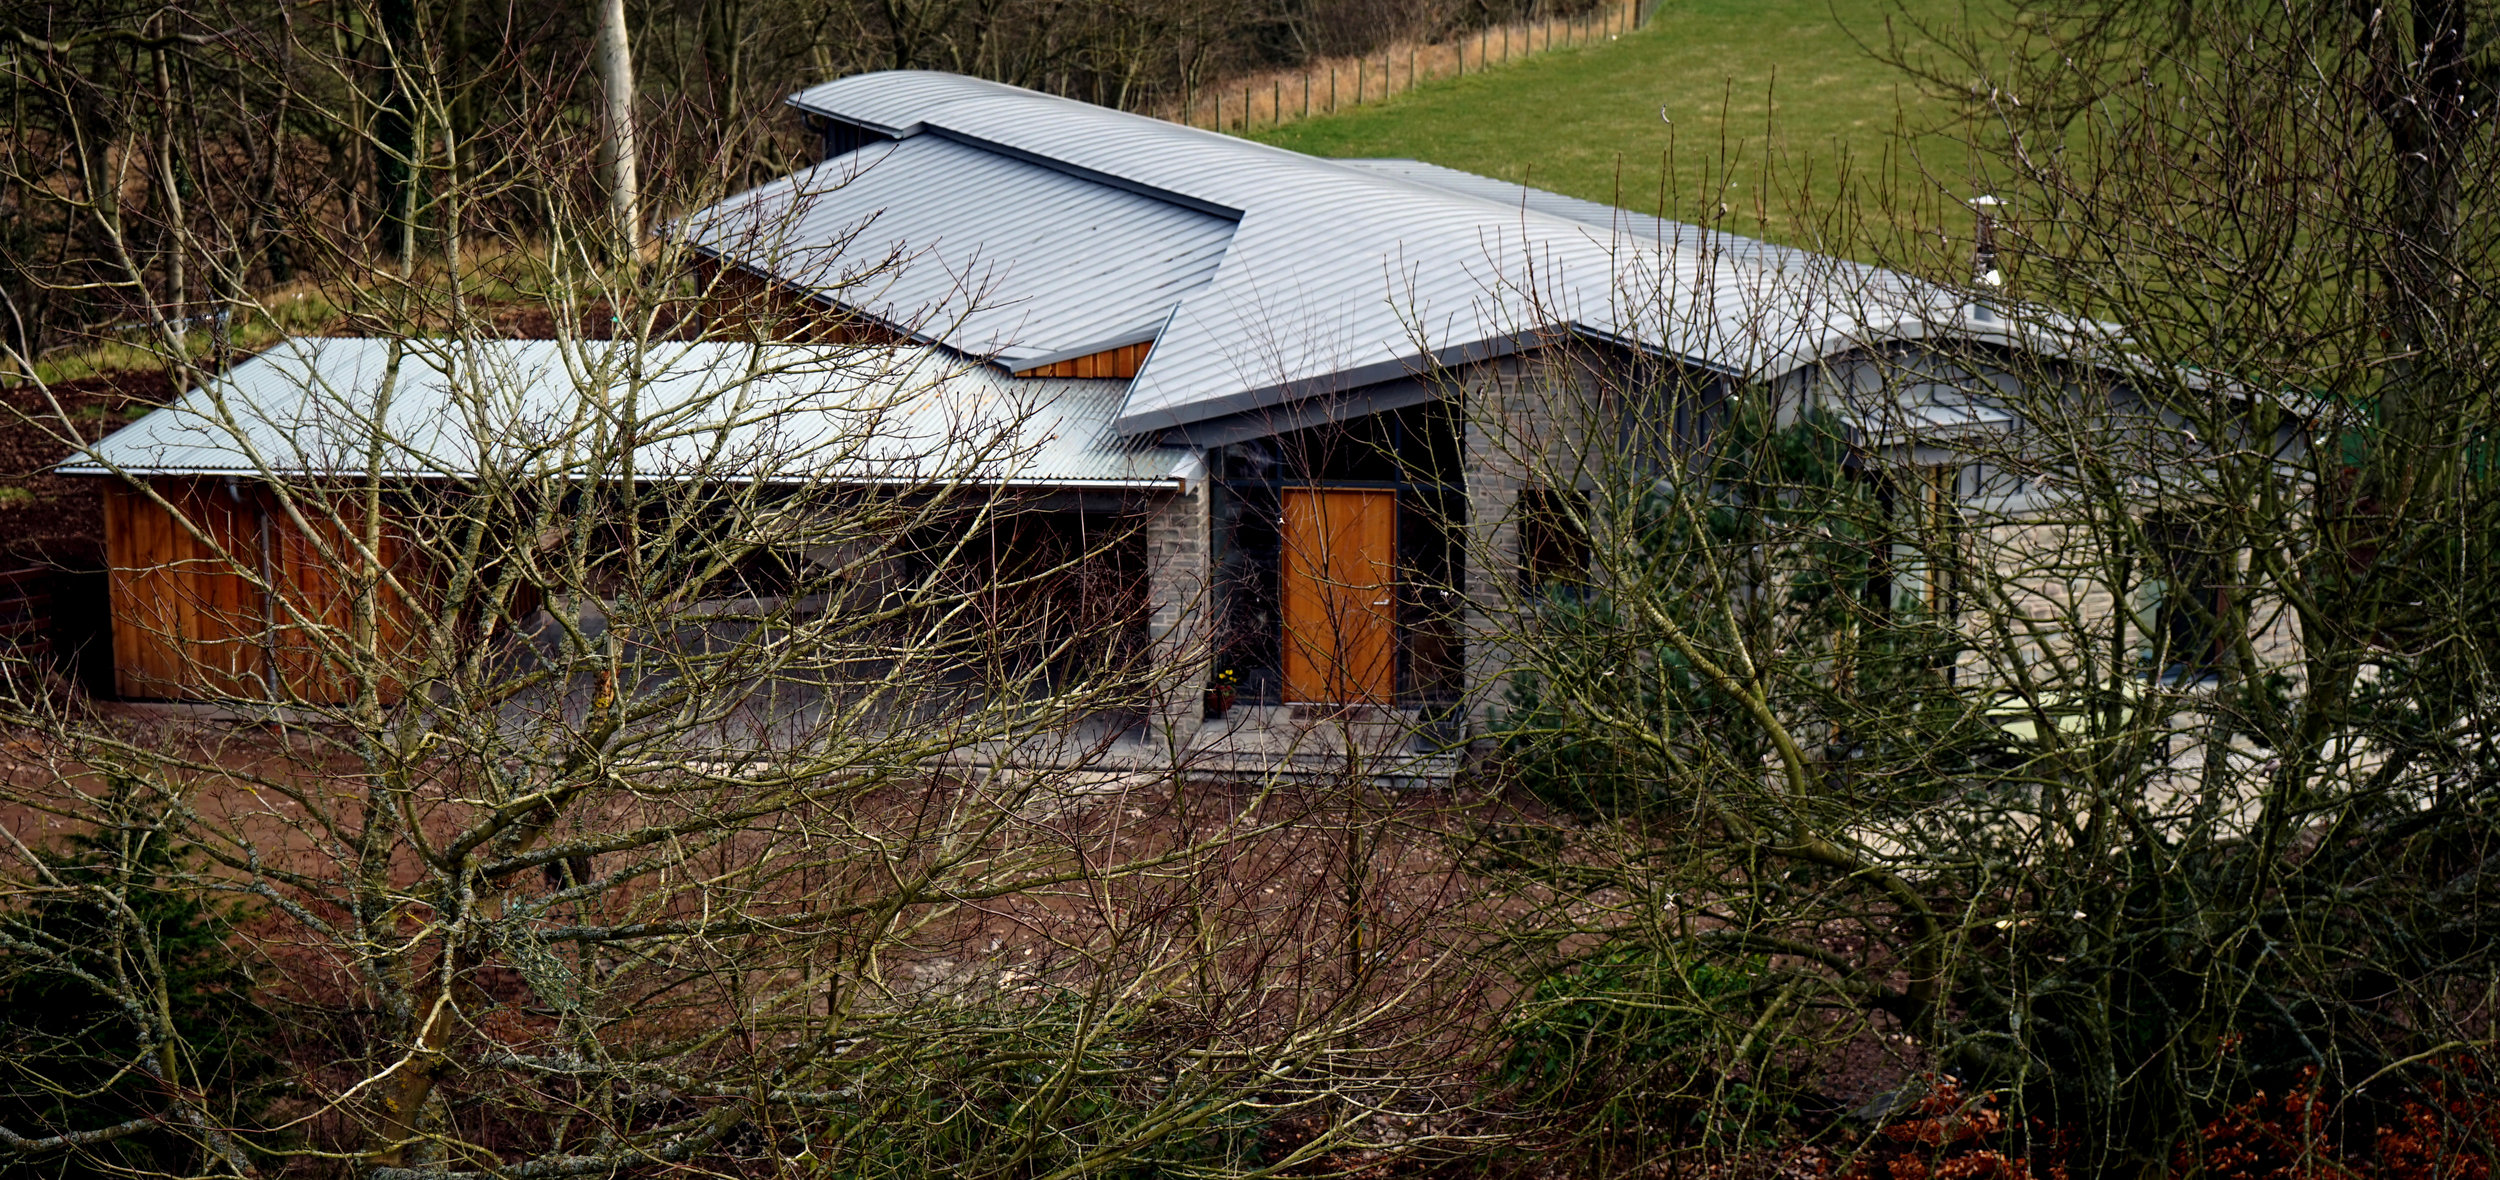 02 Greenburn roof (265x125).jpg